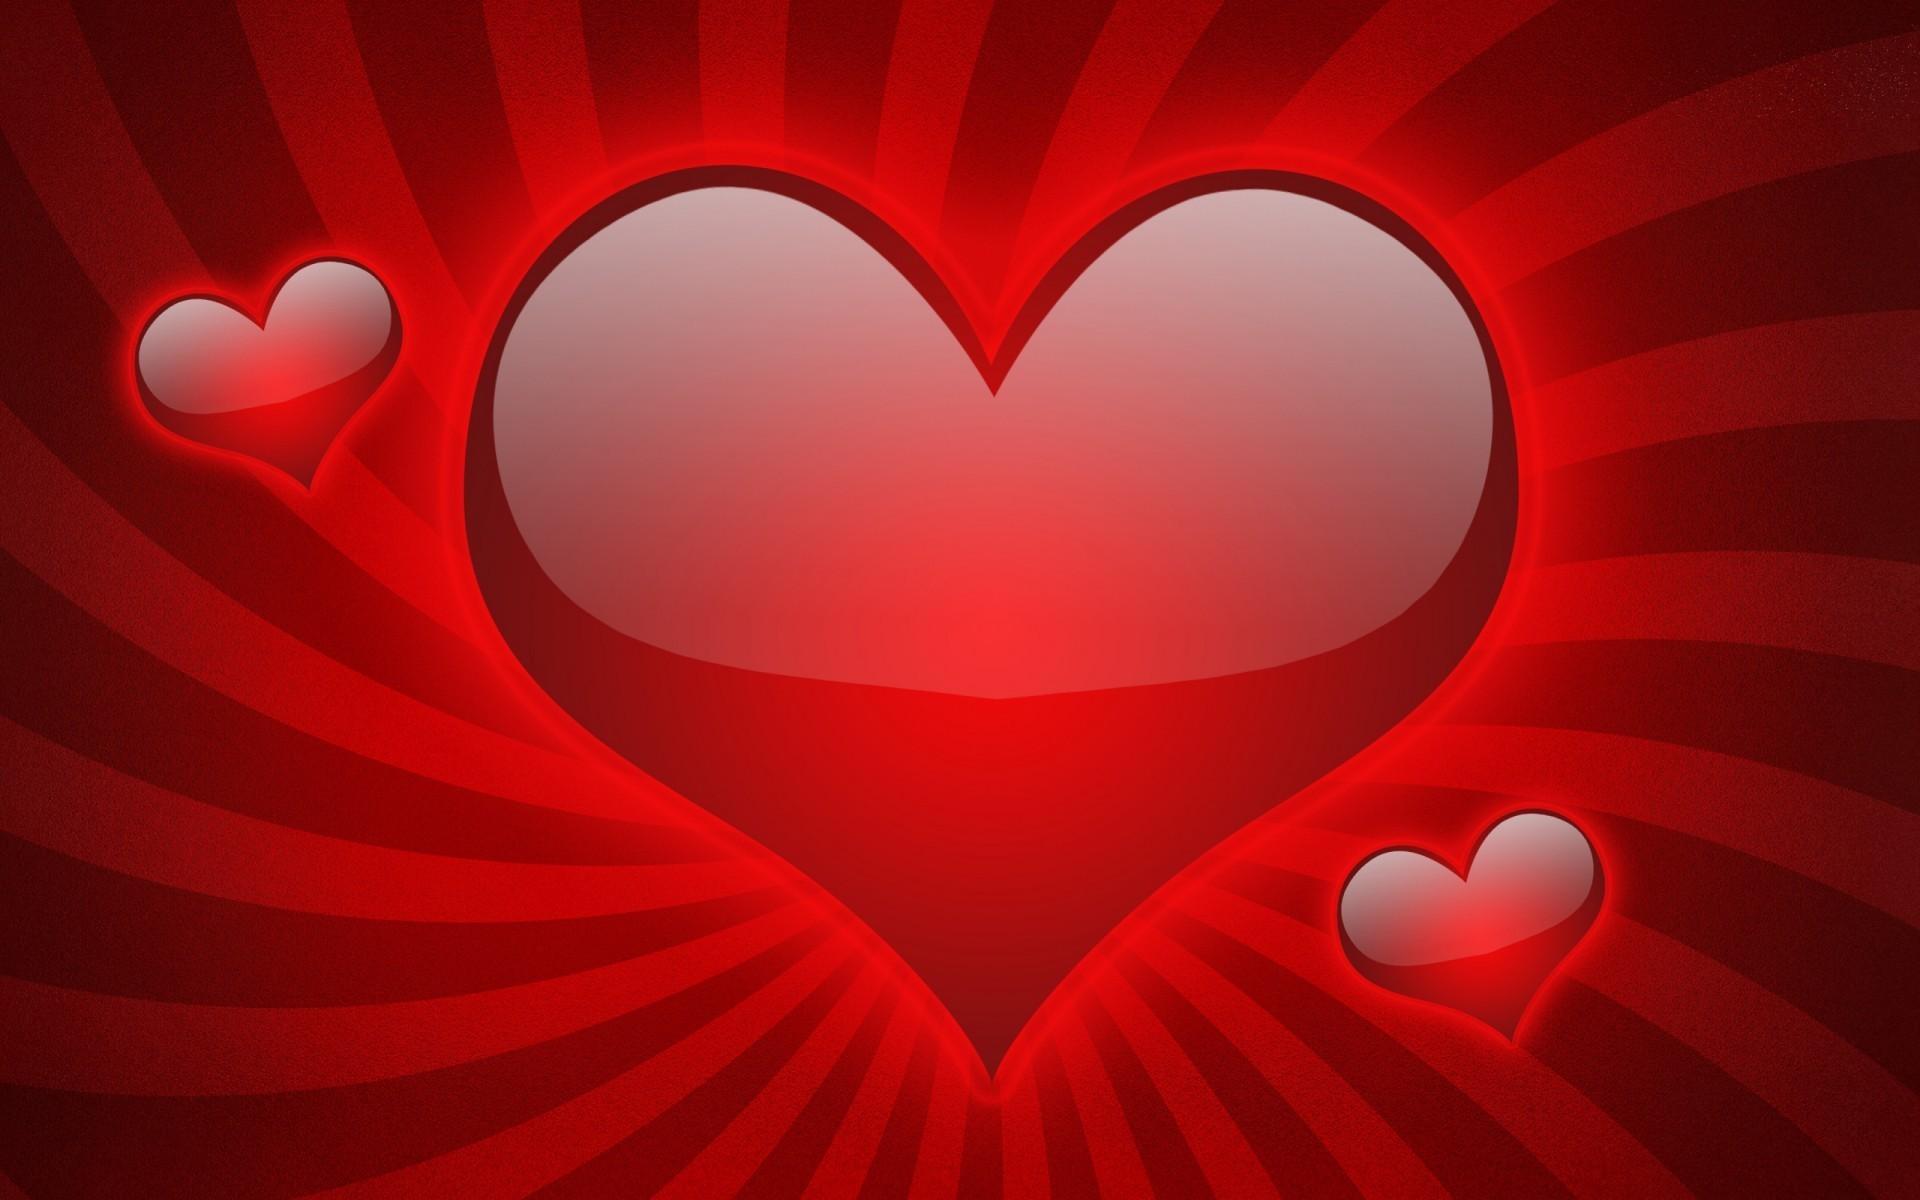 cute hearts wallpaper ·①